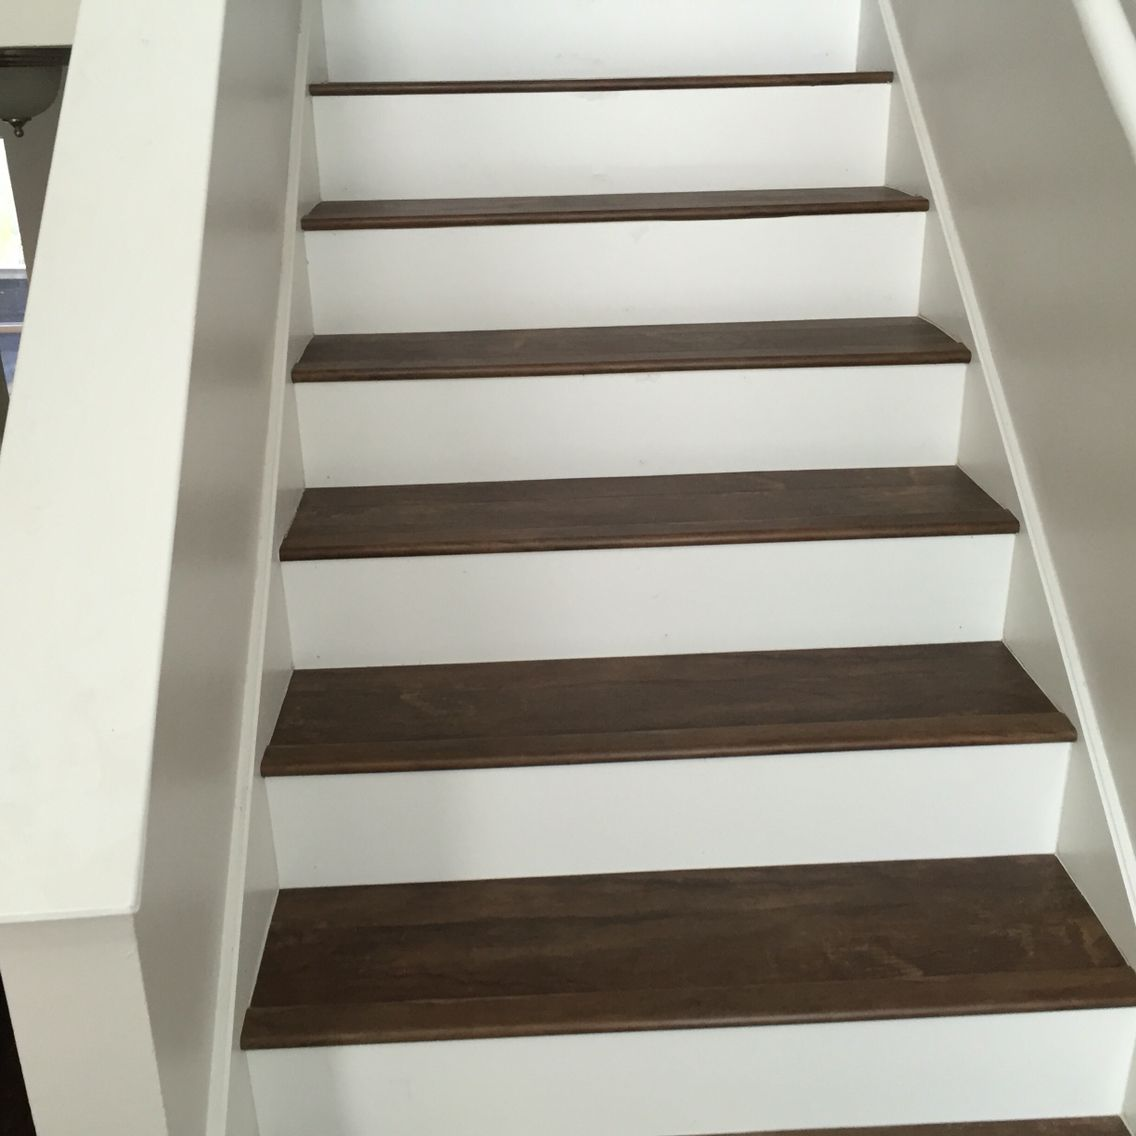 Luxury Vinyl Plank On Stairs With White Risers Luxury Vinyl | Wood Look Vinyl Stair Treads | Ceramic Tile | Shaw Floorte | Laminate Flooring | Roppe | Stair Makeover